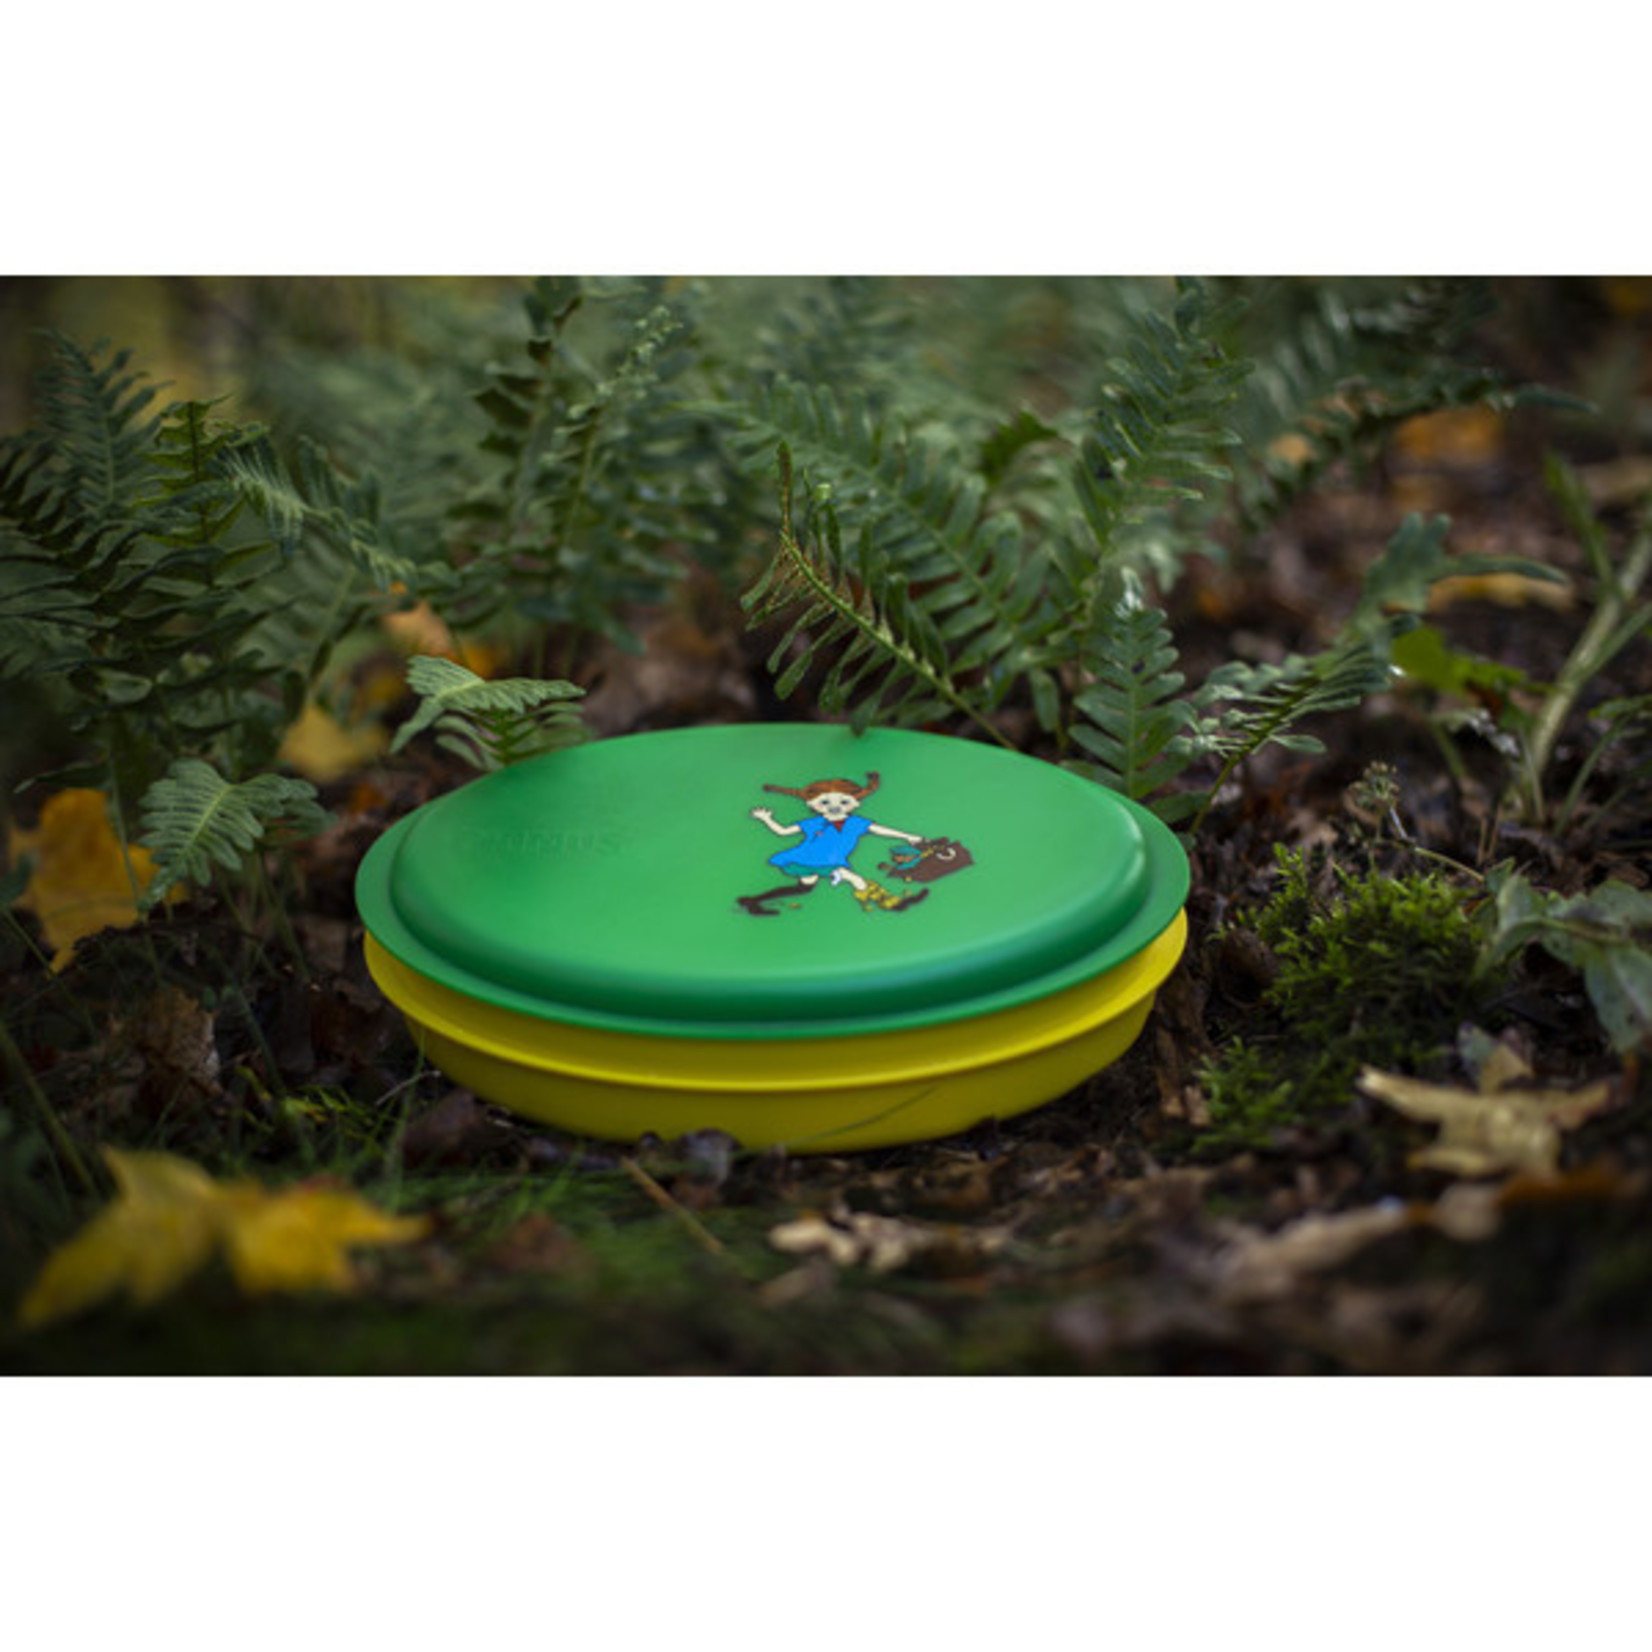 Primus Primus lunchbox Pippi Langkous 5-delig, groen